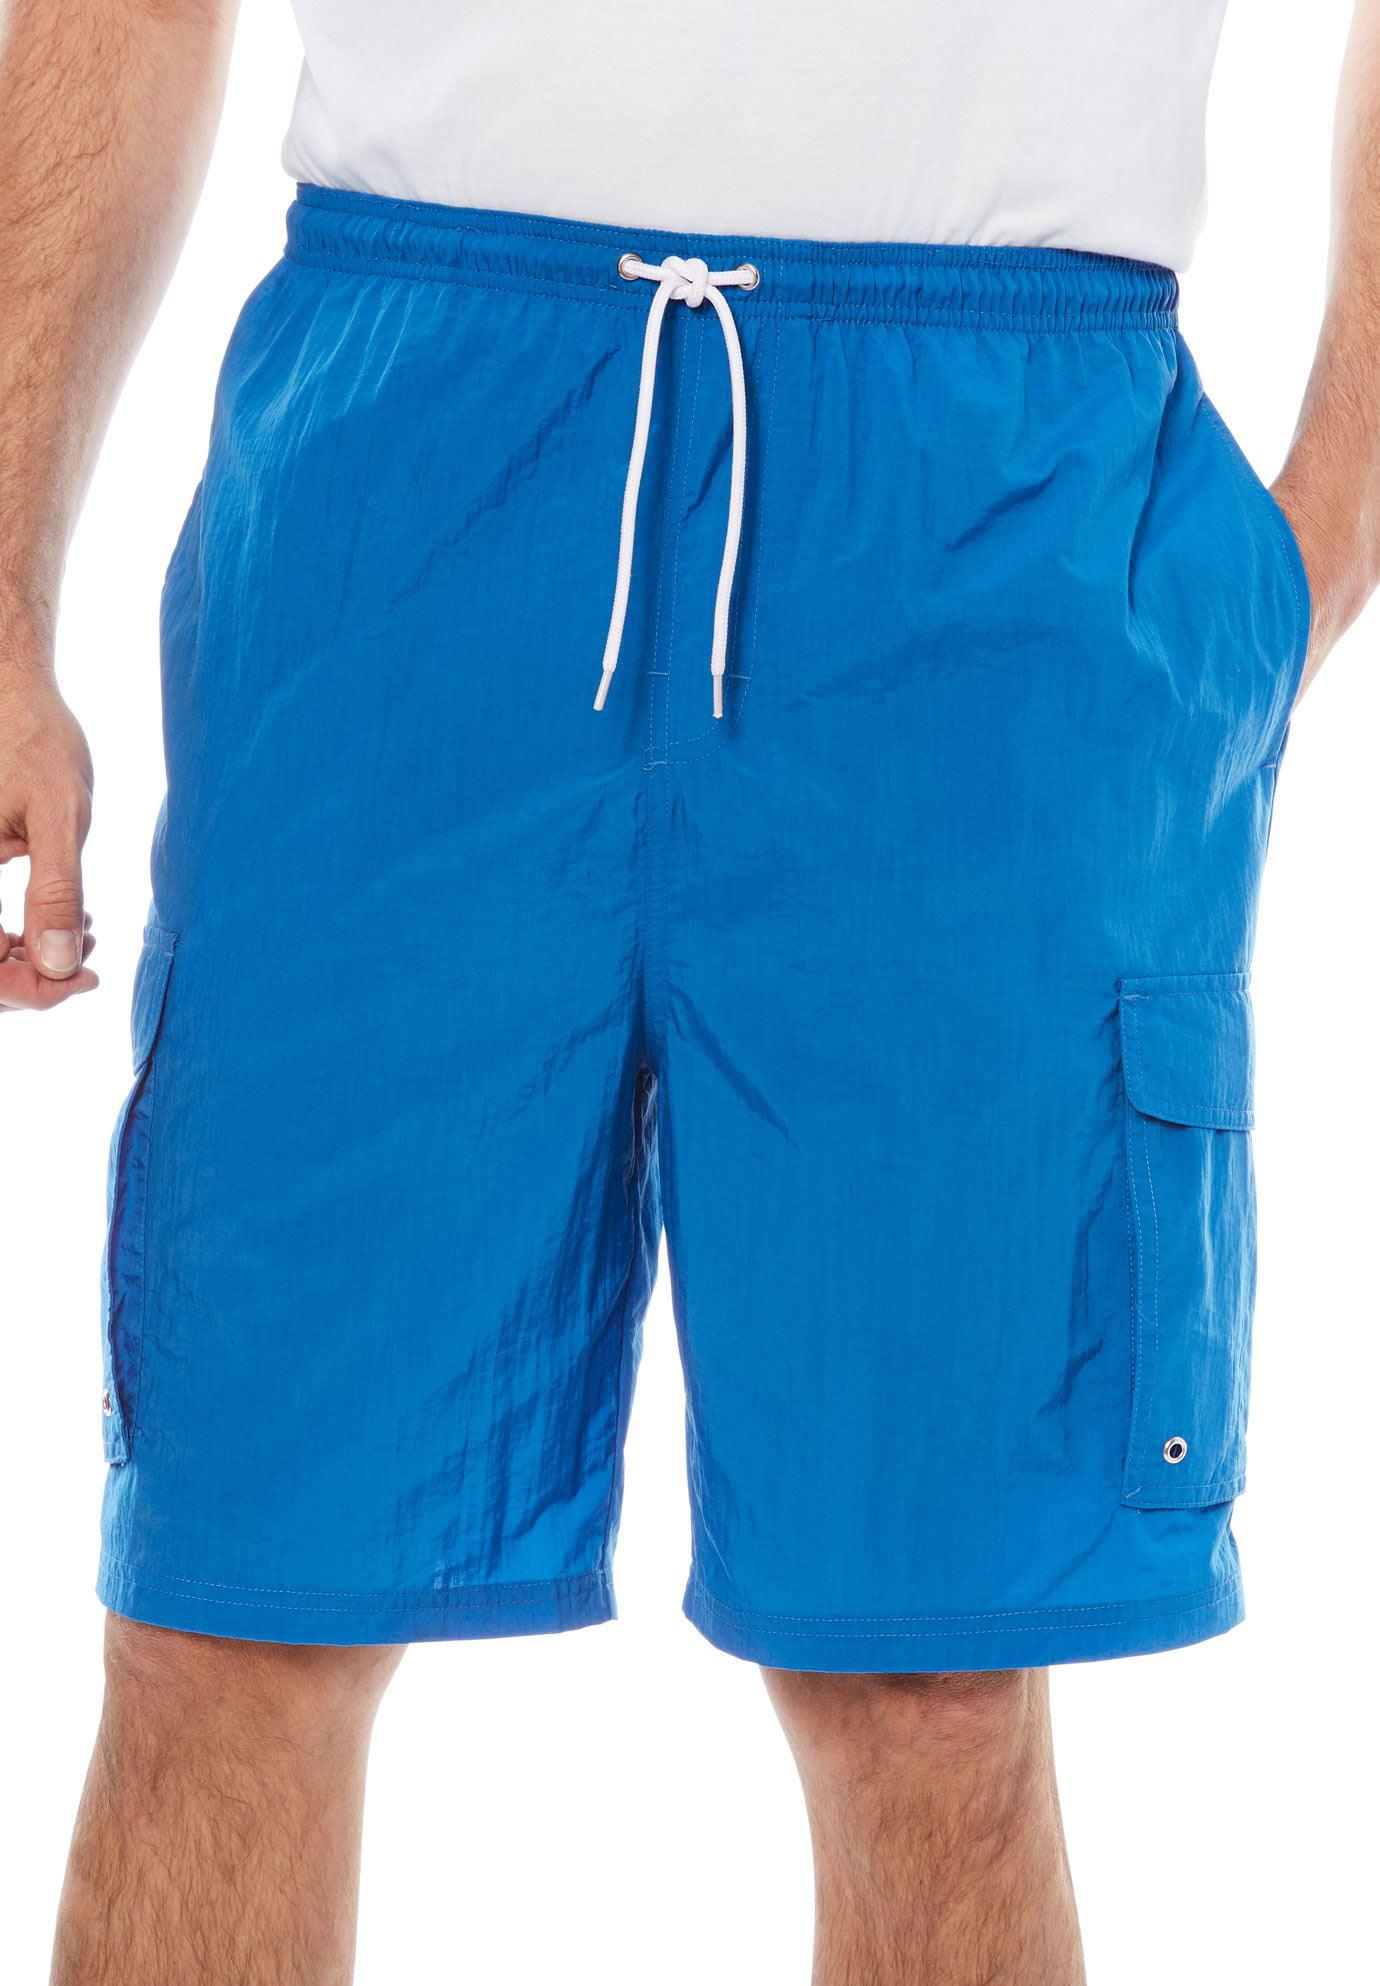 Kingsize Men's Big & Tall Nylon Cargo Swim Trunks